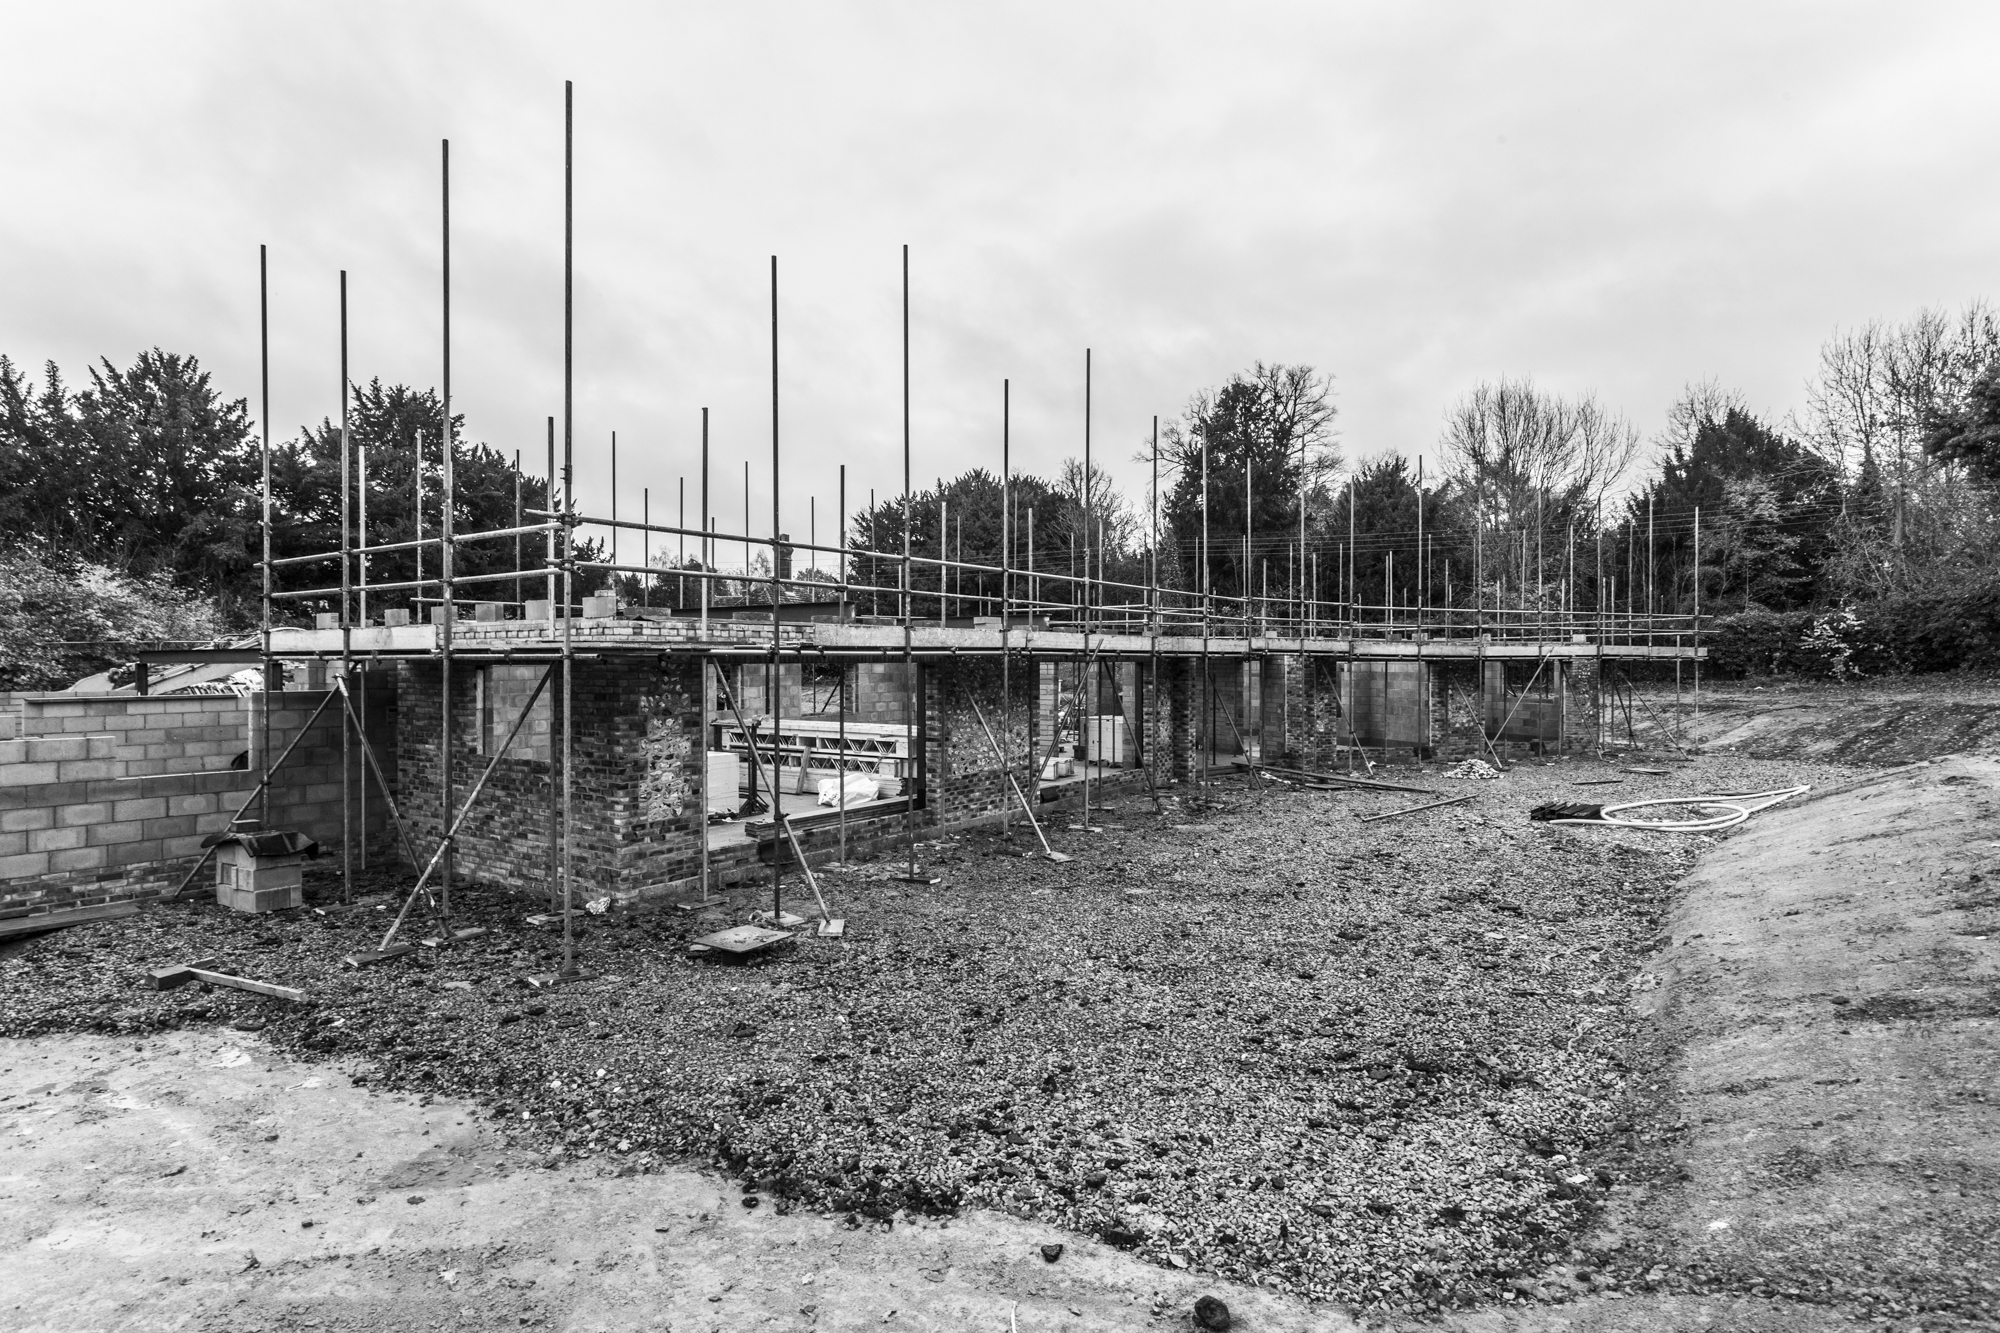 FlinthurstHouse_Construction_06.jpg